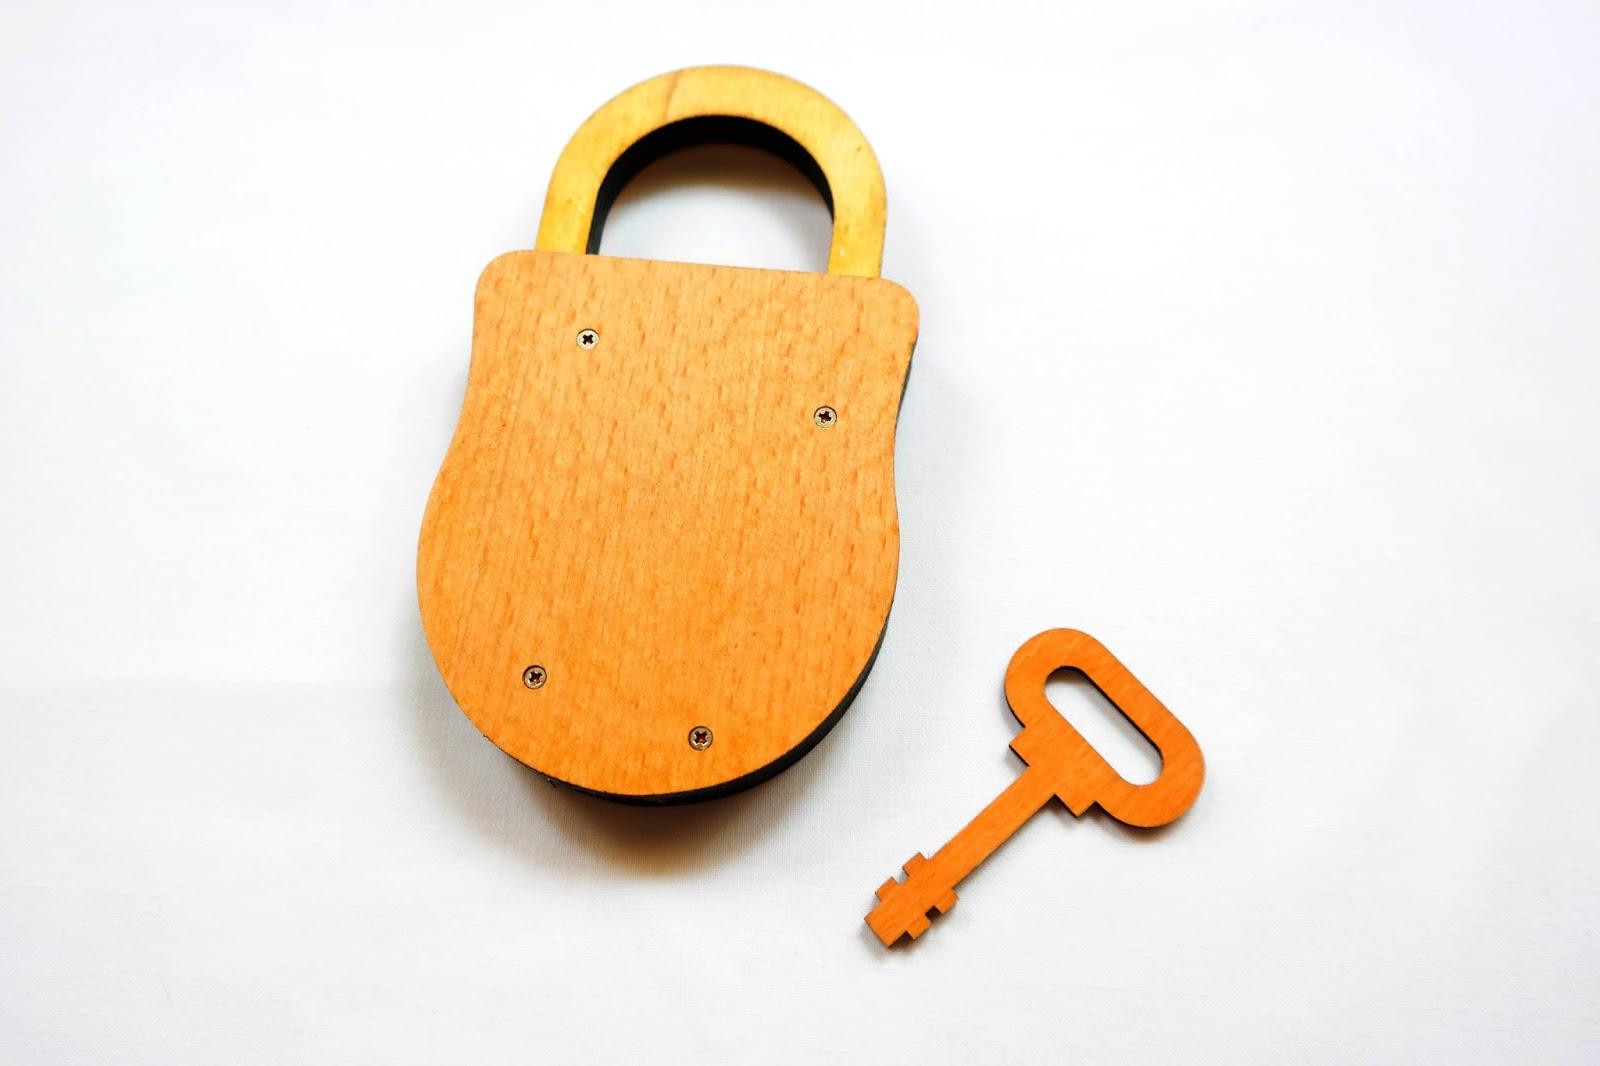 Orange lock and key